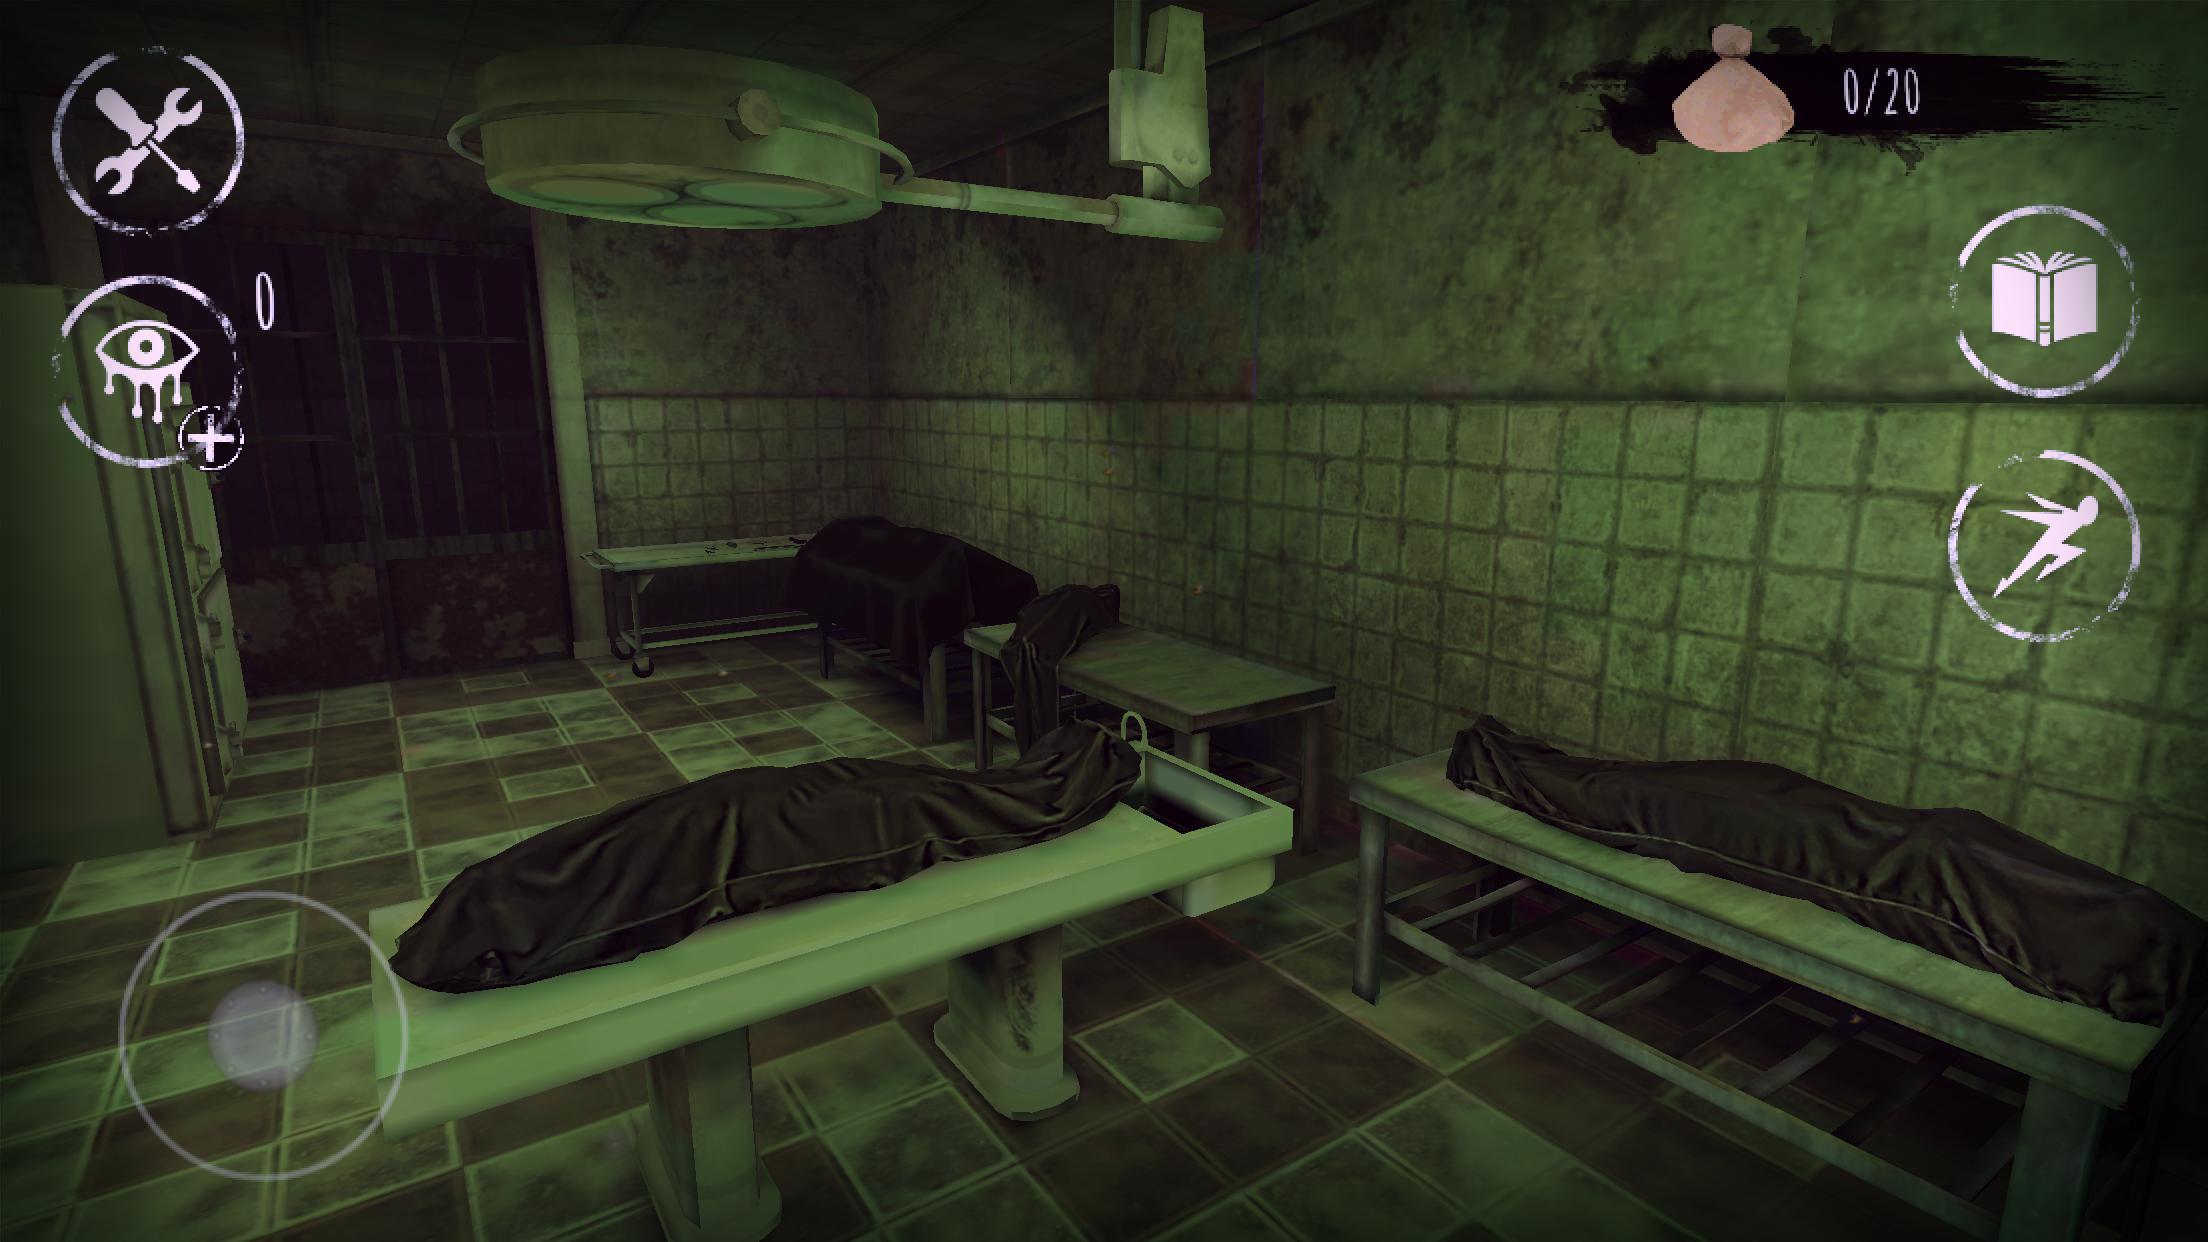 Eyes: Scary Thriller - Creepy Horror Game 6.1.1 Screenshot 15